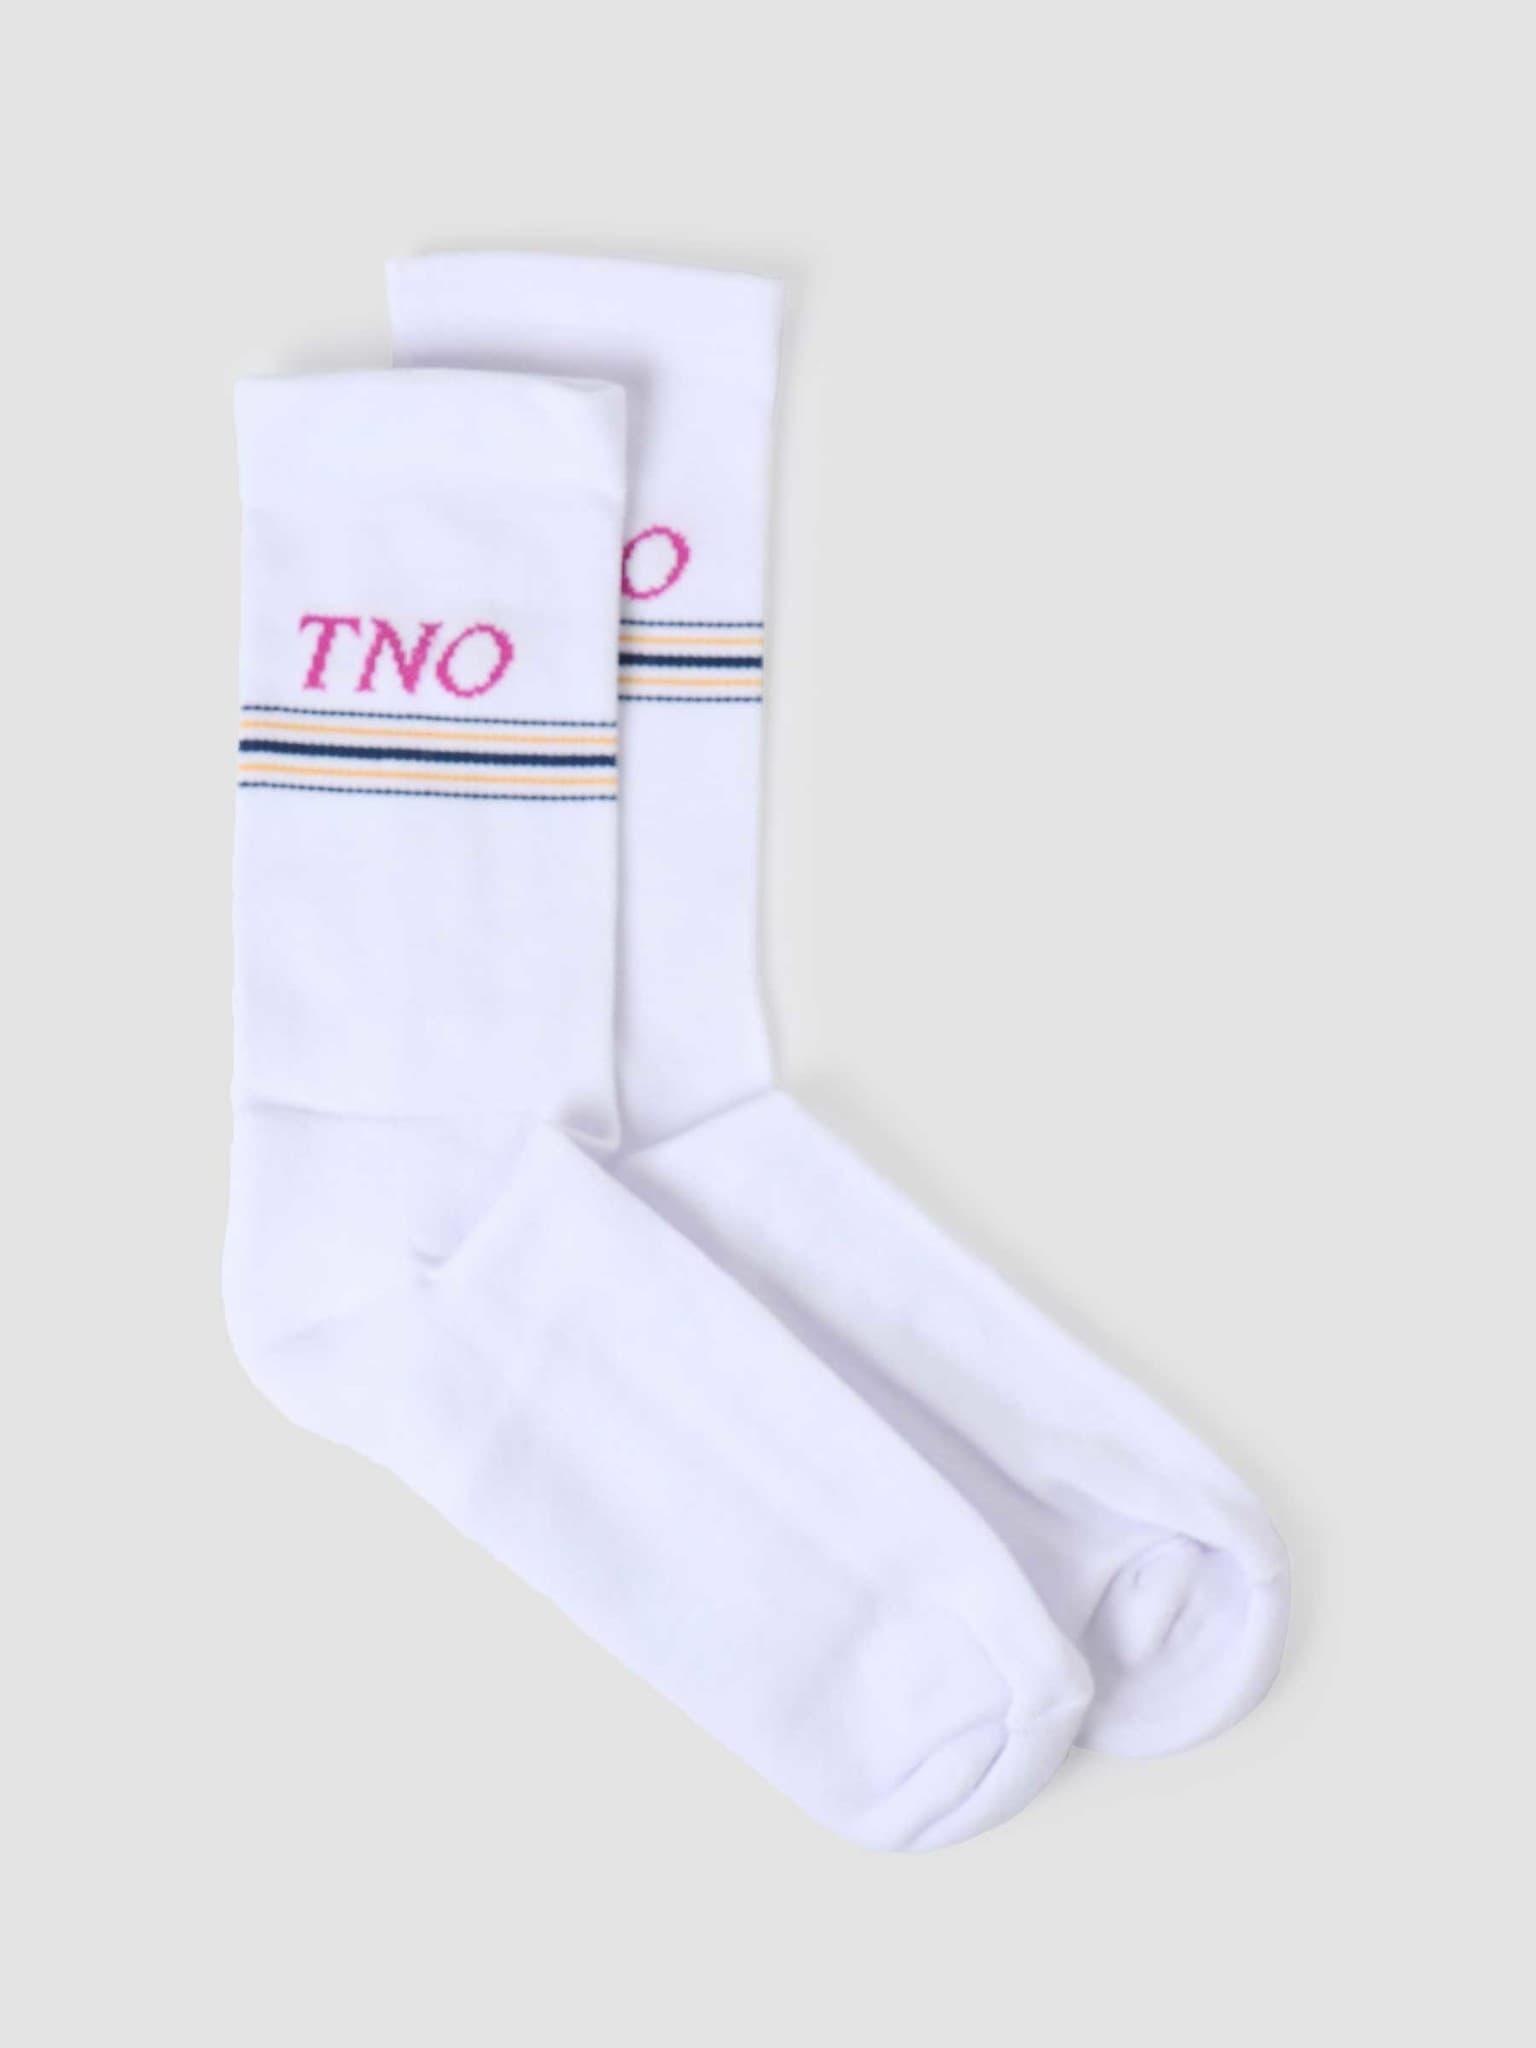 Tno Underline Socks White